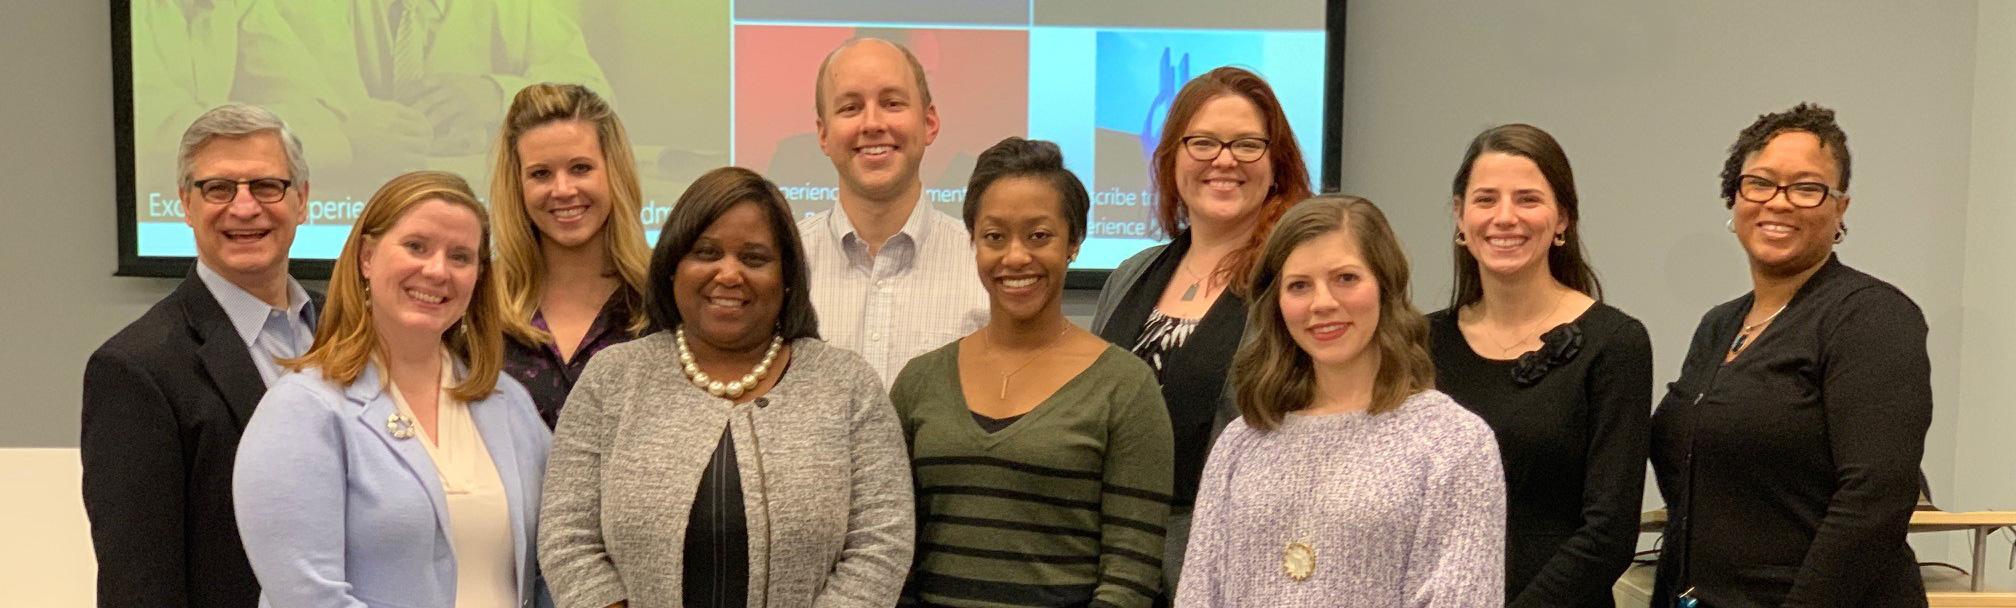 Community Relations team 2019